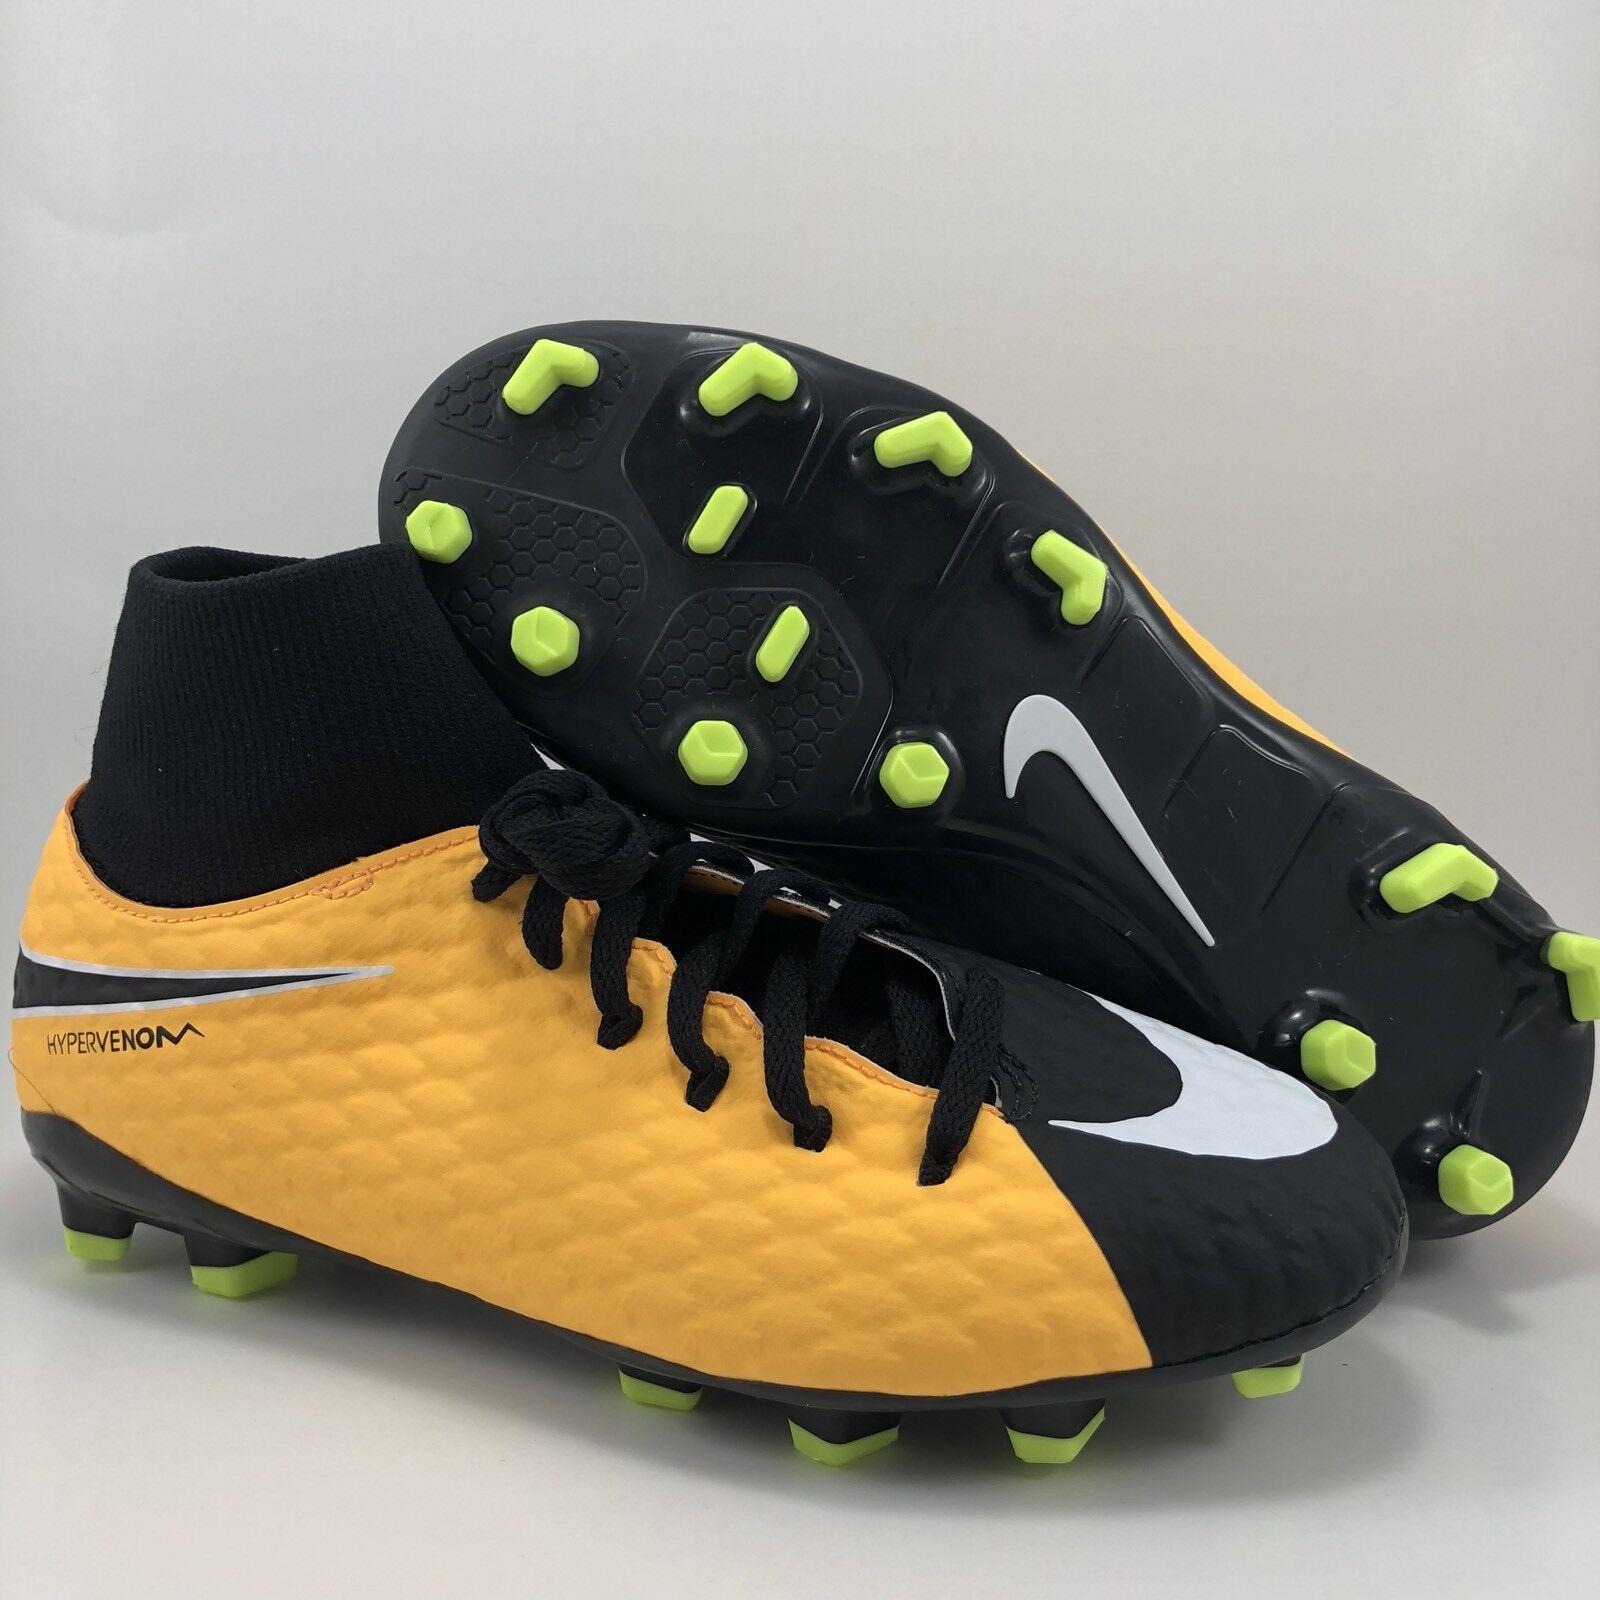 Nike hypervemon Phelon III DF FG Botines de fútbol Juventud tamaño 6Y (917772 801)